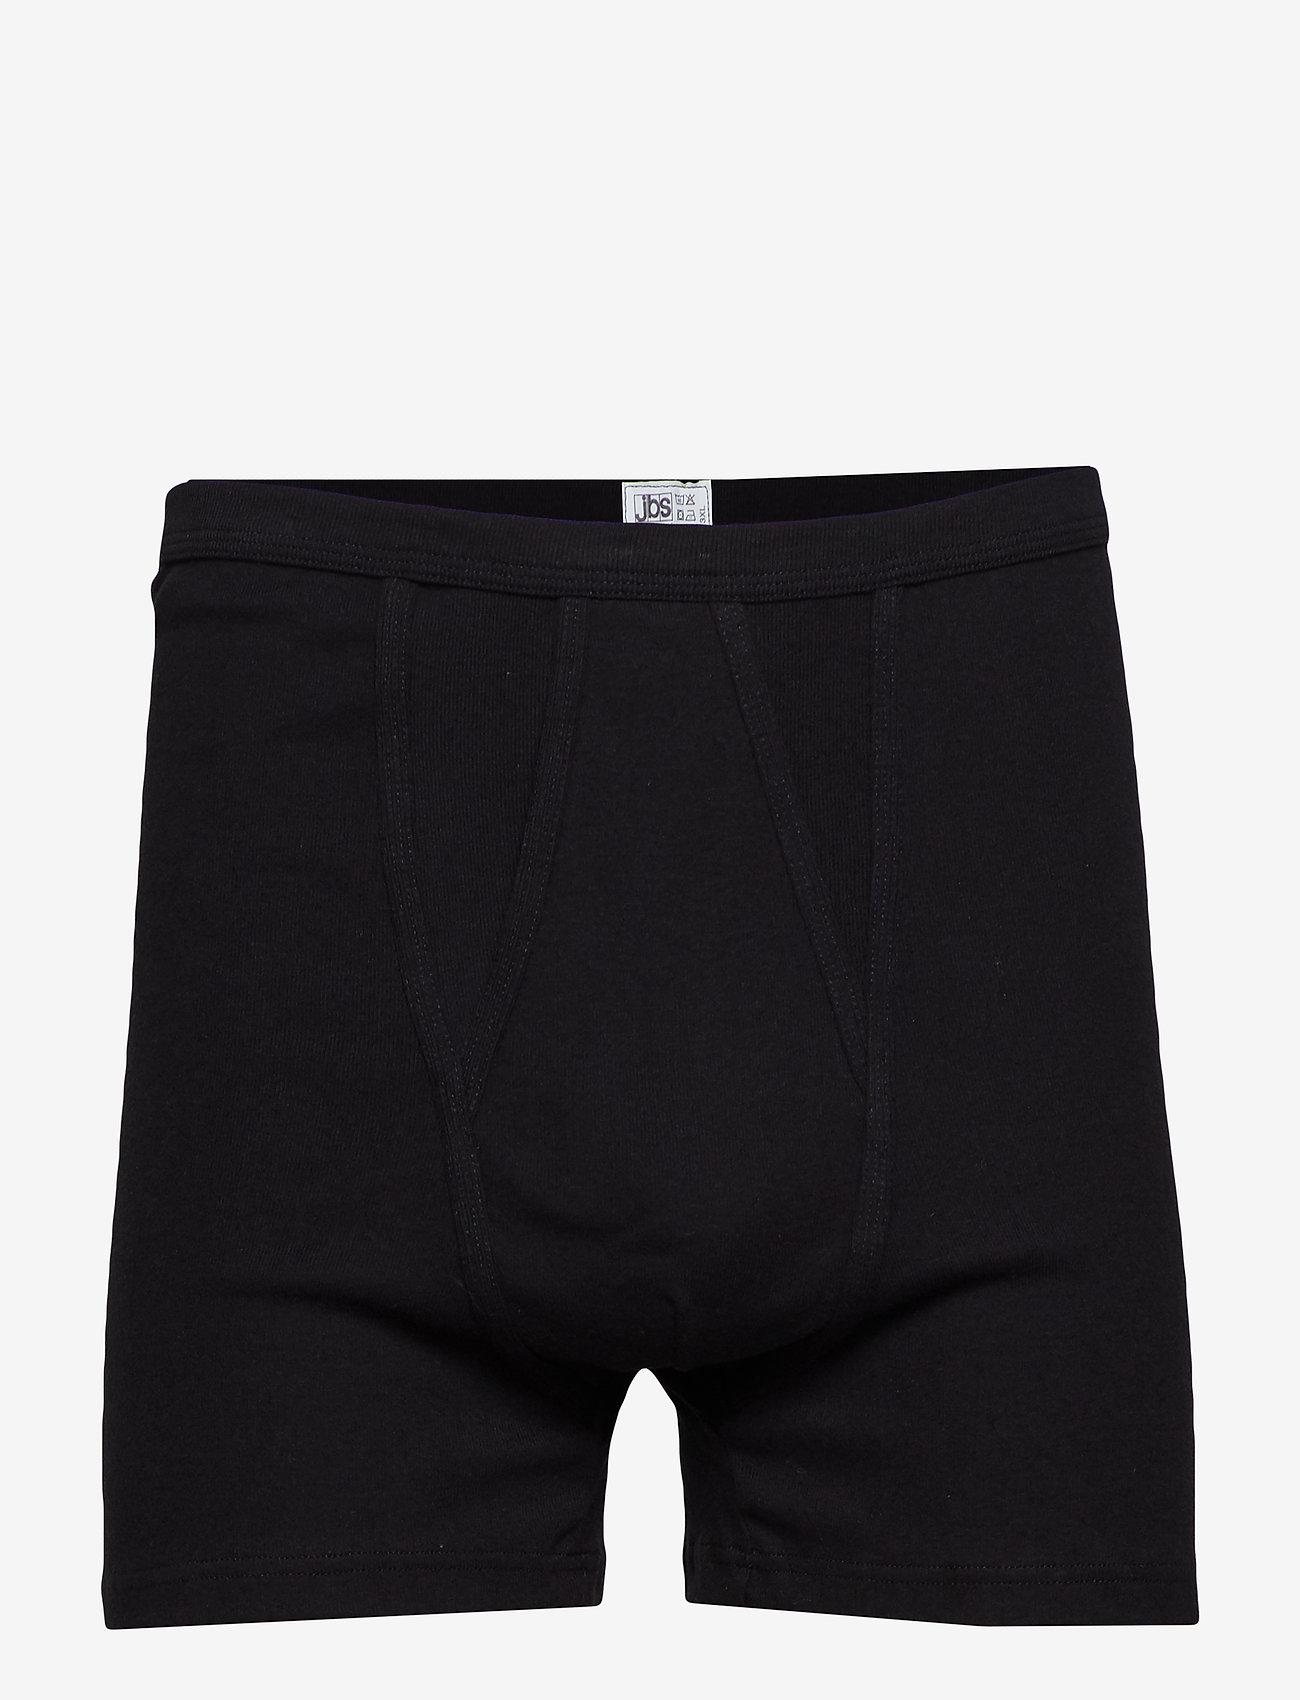 JBS - JBS short legs with fly - ondergoed - black